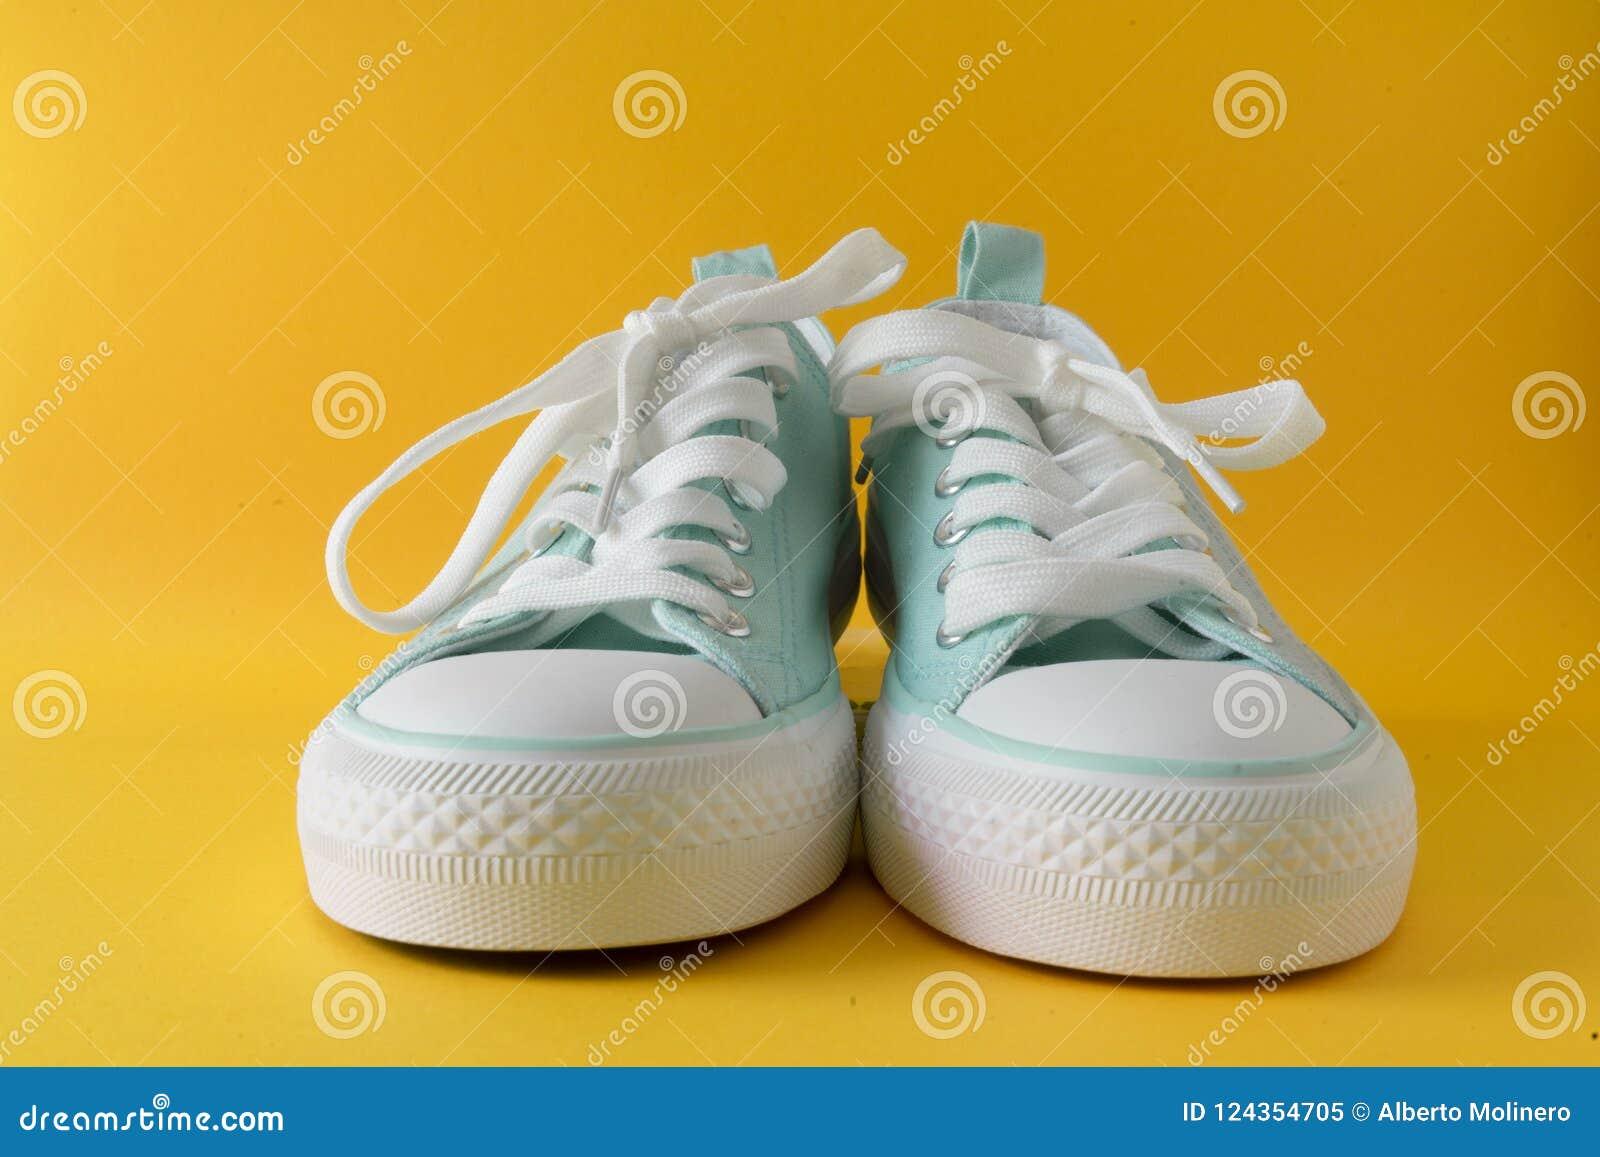 938bb6189e5 Ένα ζευγάρι των πάνινων παπουτσιών σε ένα κίτρινο υπόβαθρο Λαϊκά χρώματα  και ένα σύγχρονο ζευγάρι των παπουτσιών